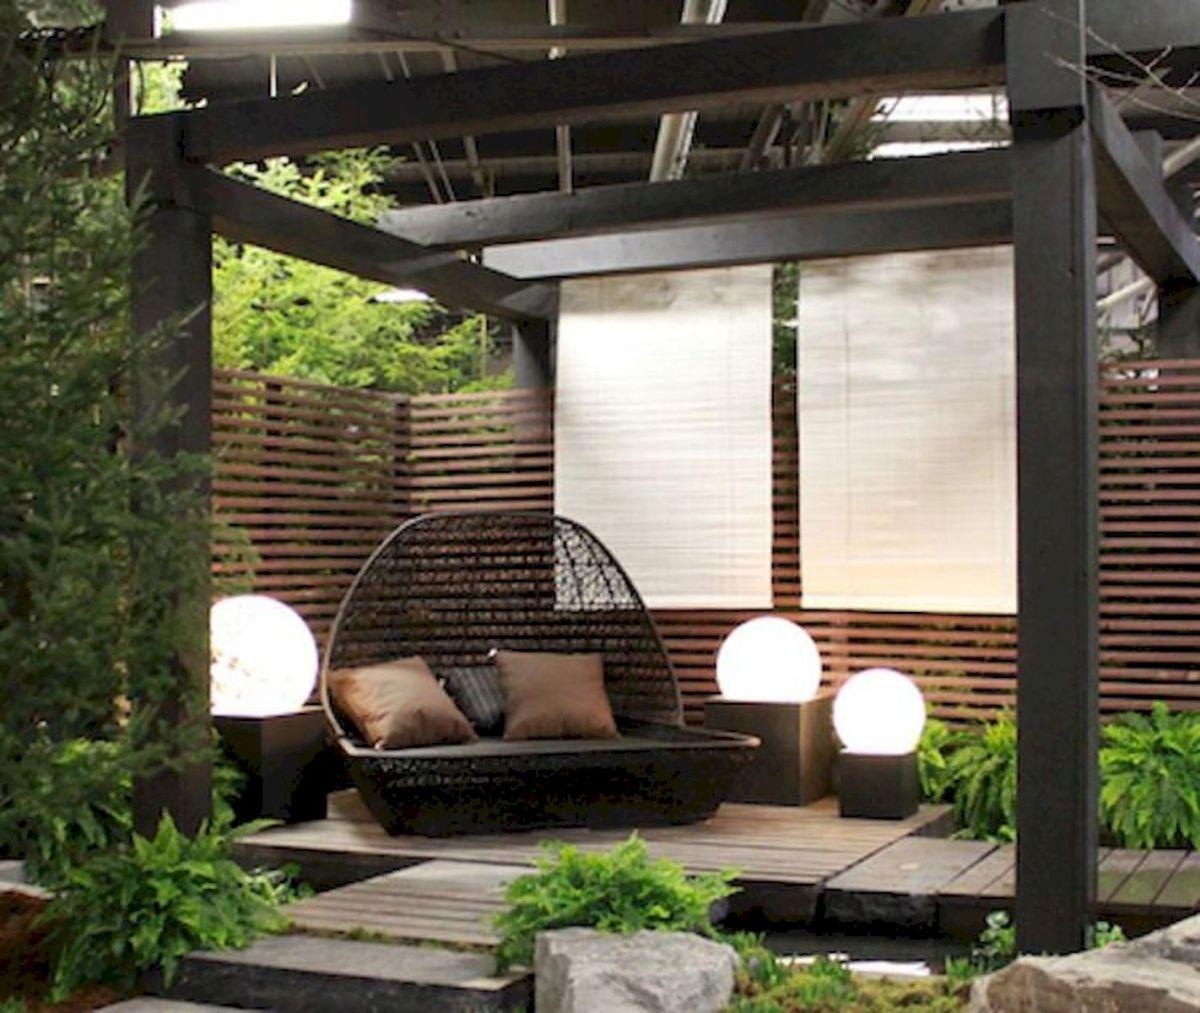 60 Awesome DIY Backyard Privacy Design and Decor Ideas (51)